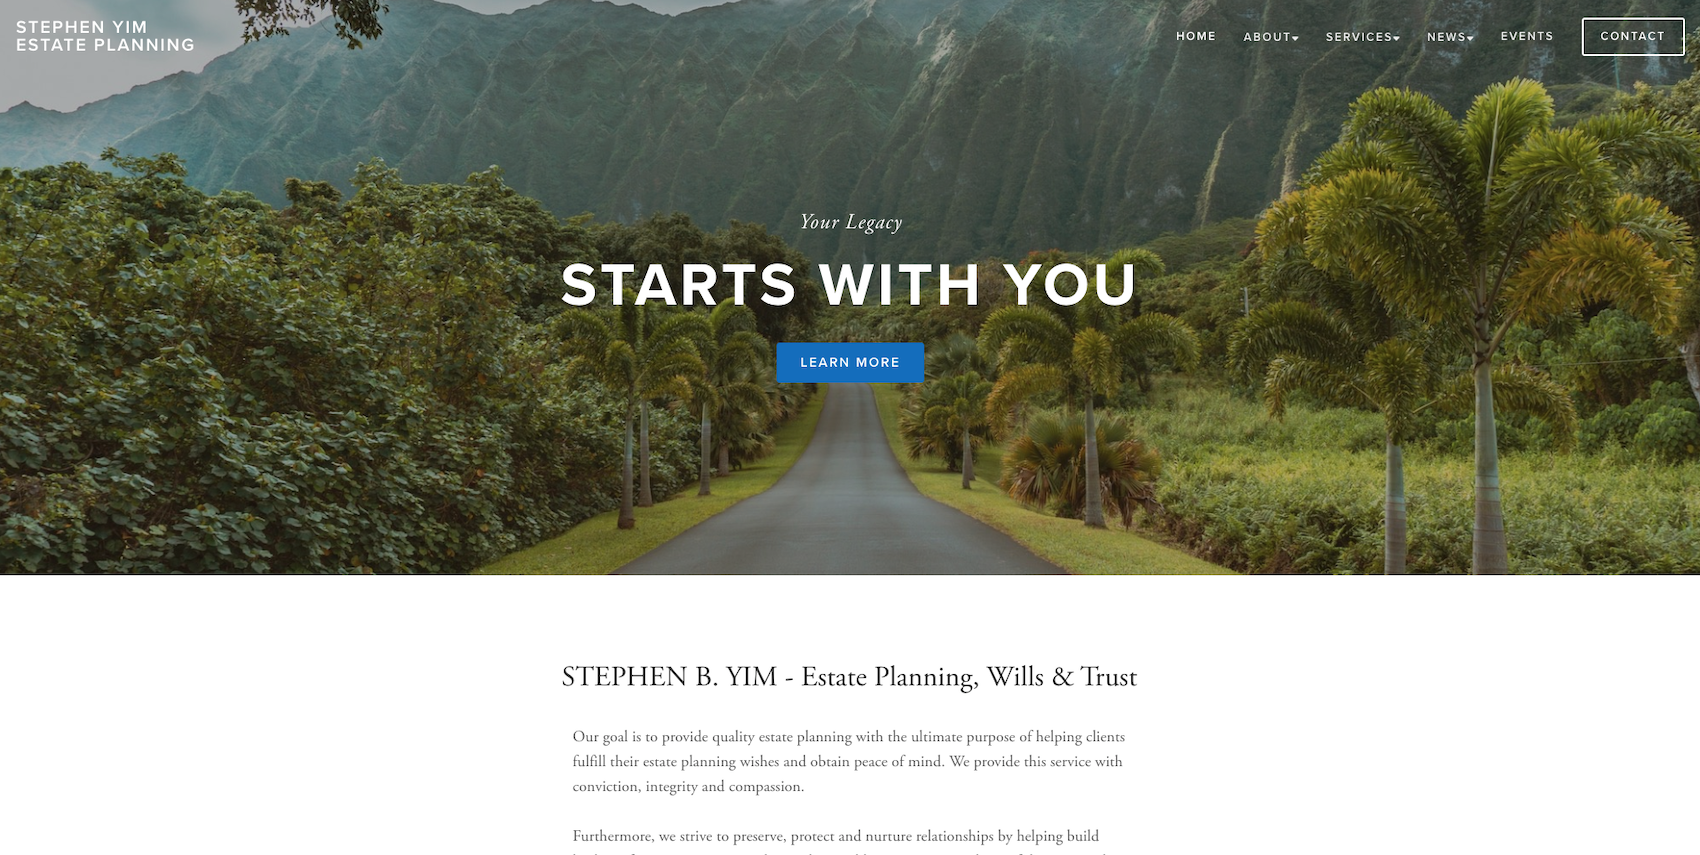 Stephen Yim Estate Planning - Site Migration & Customization, Image Curation